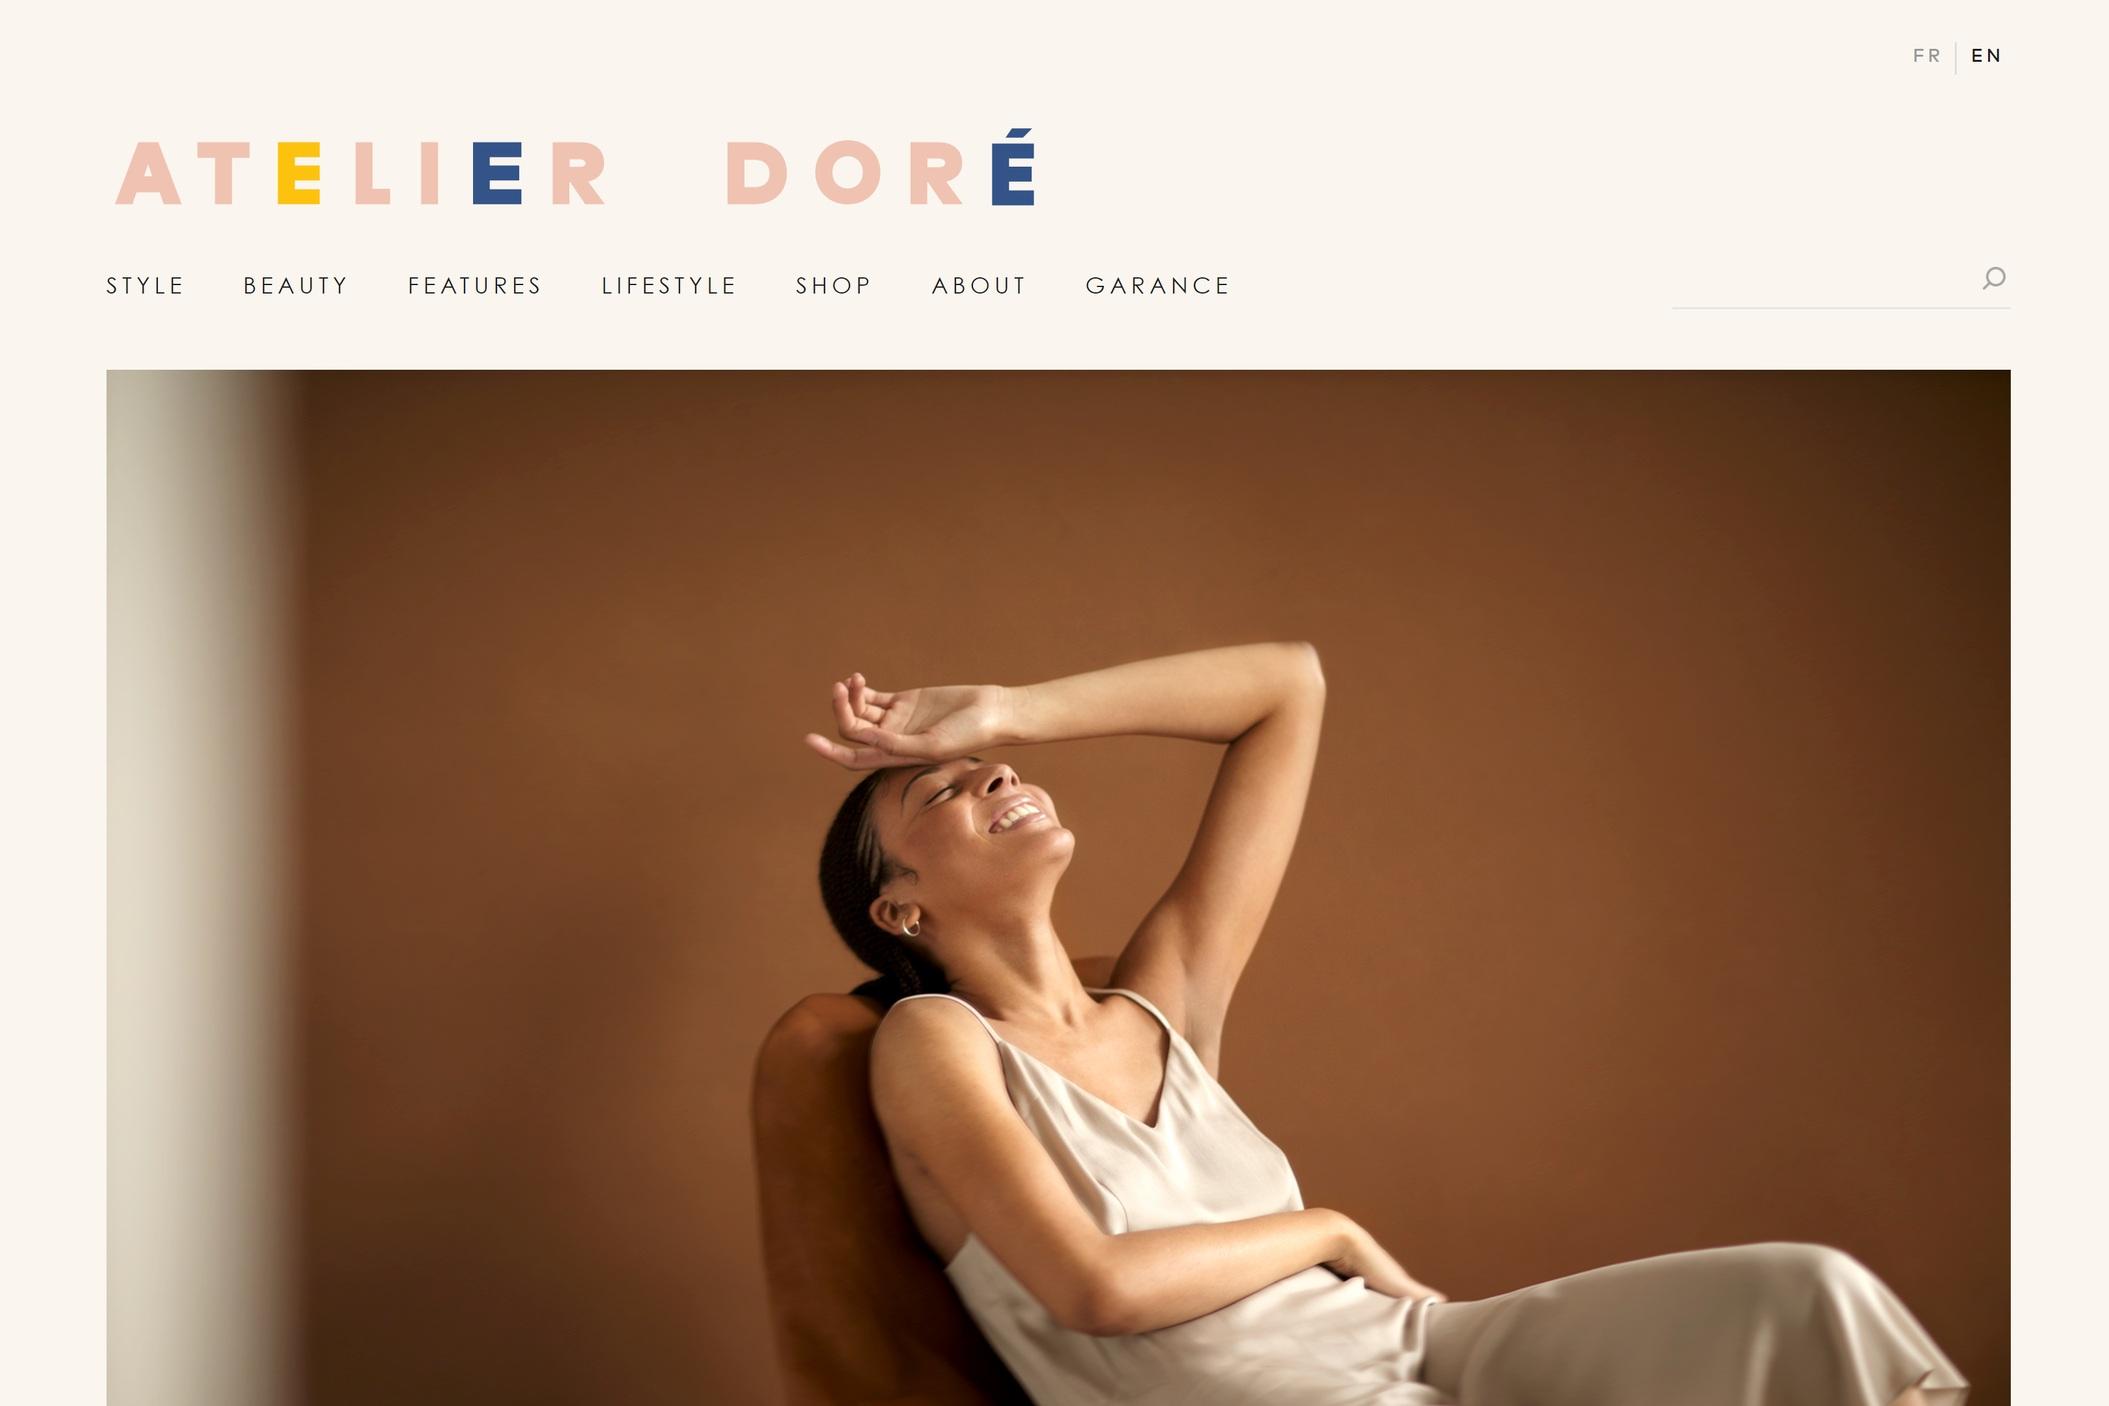 Atelier Dore - Best Lifestyle Website